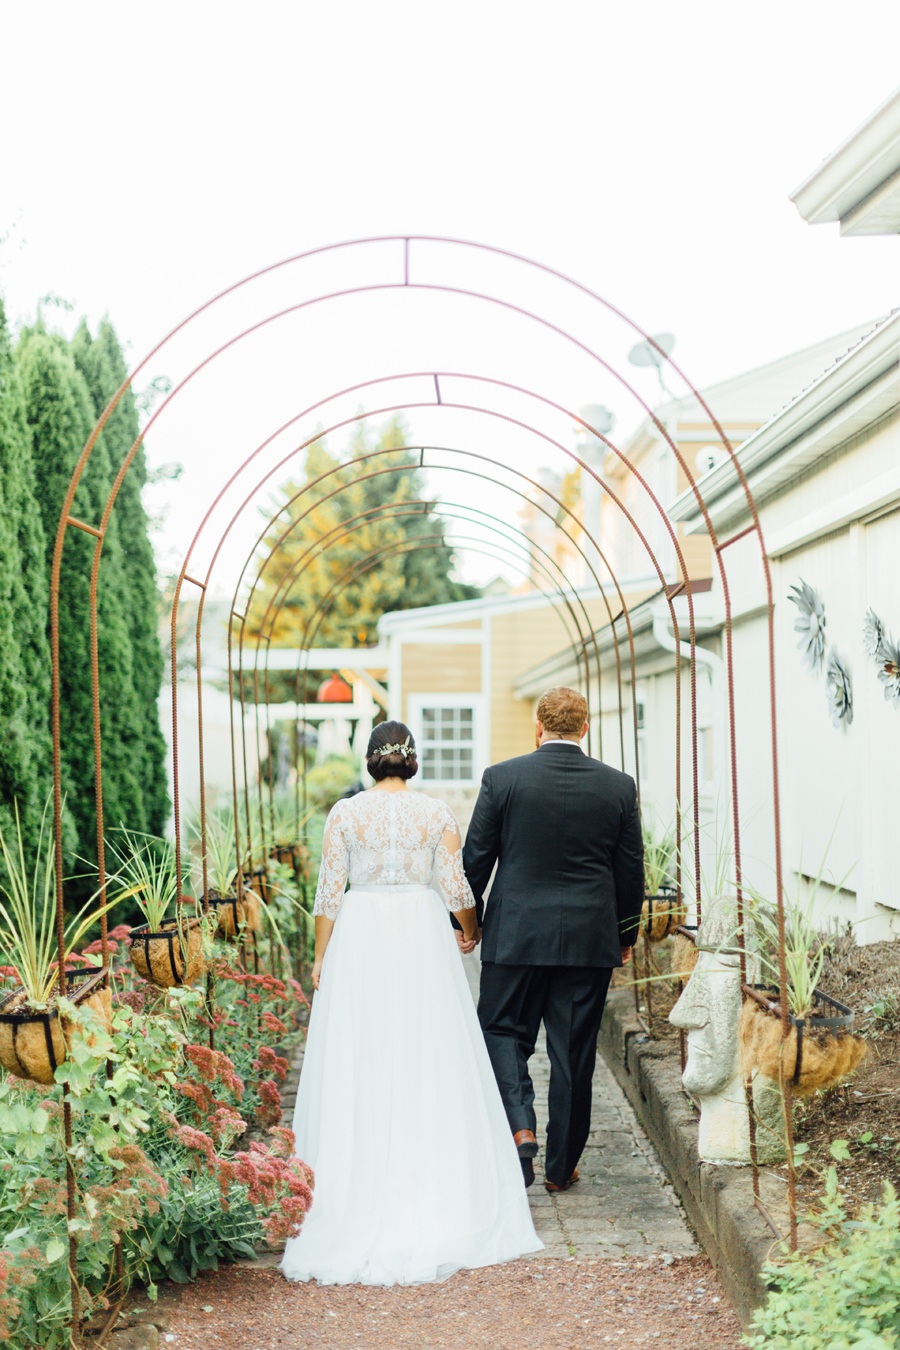 the-inn-at-leola-wedding-lancaster-pennsylvania-wedding-photographer-rebeka-viola-photograhy (93).jpg